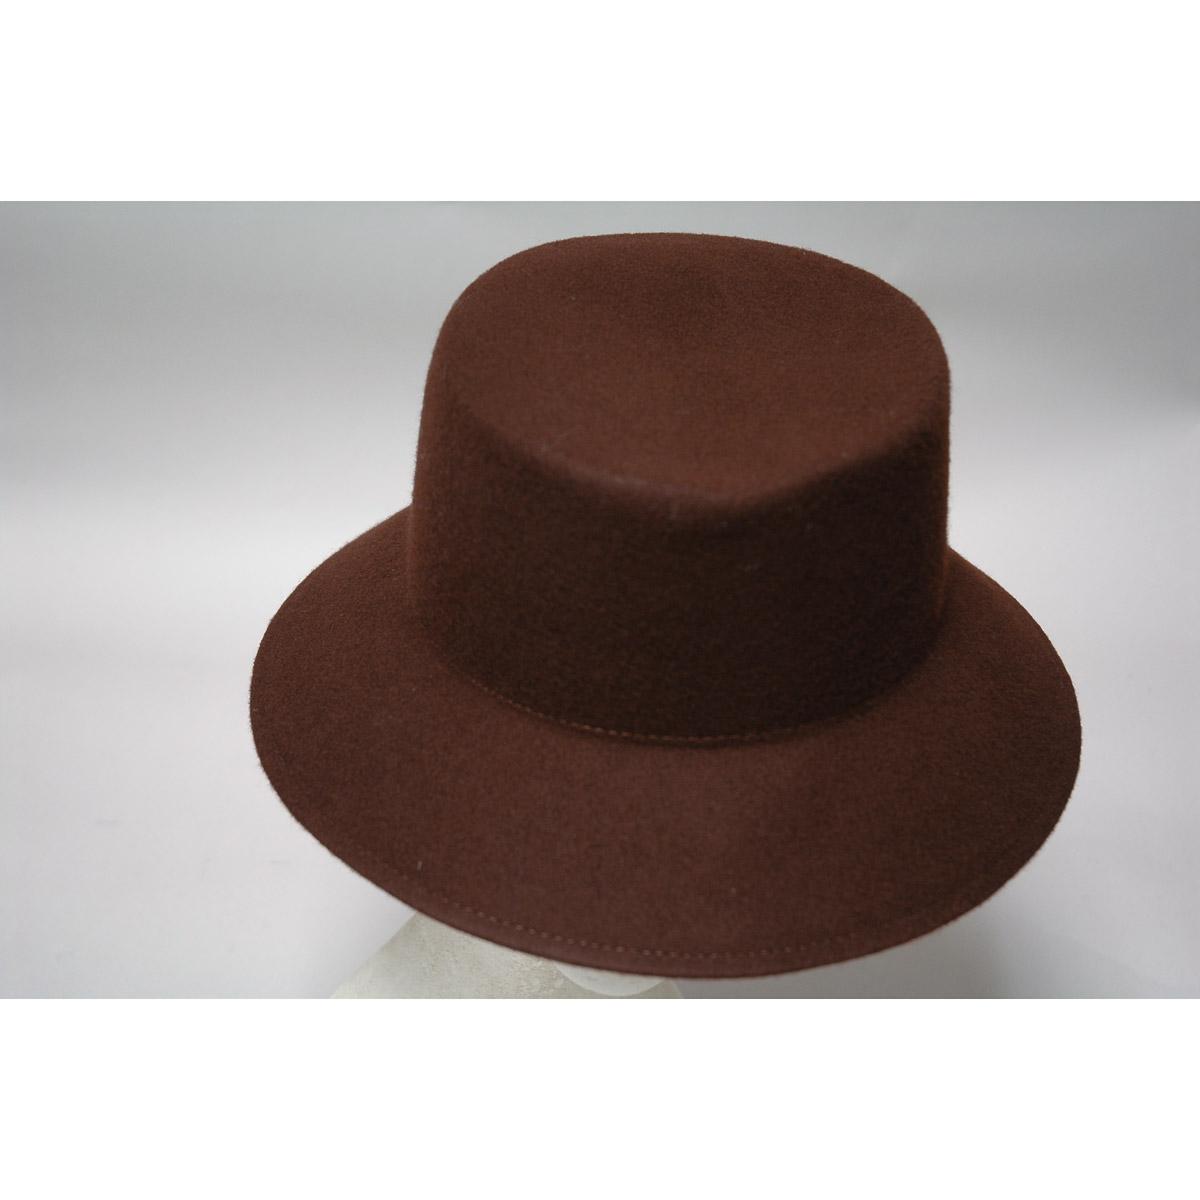 de8d48c195a5a Dark Brown Lampshade Small Brim Flat Top Blocked Untrimmed Felt Hat Base